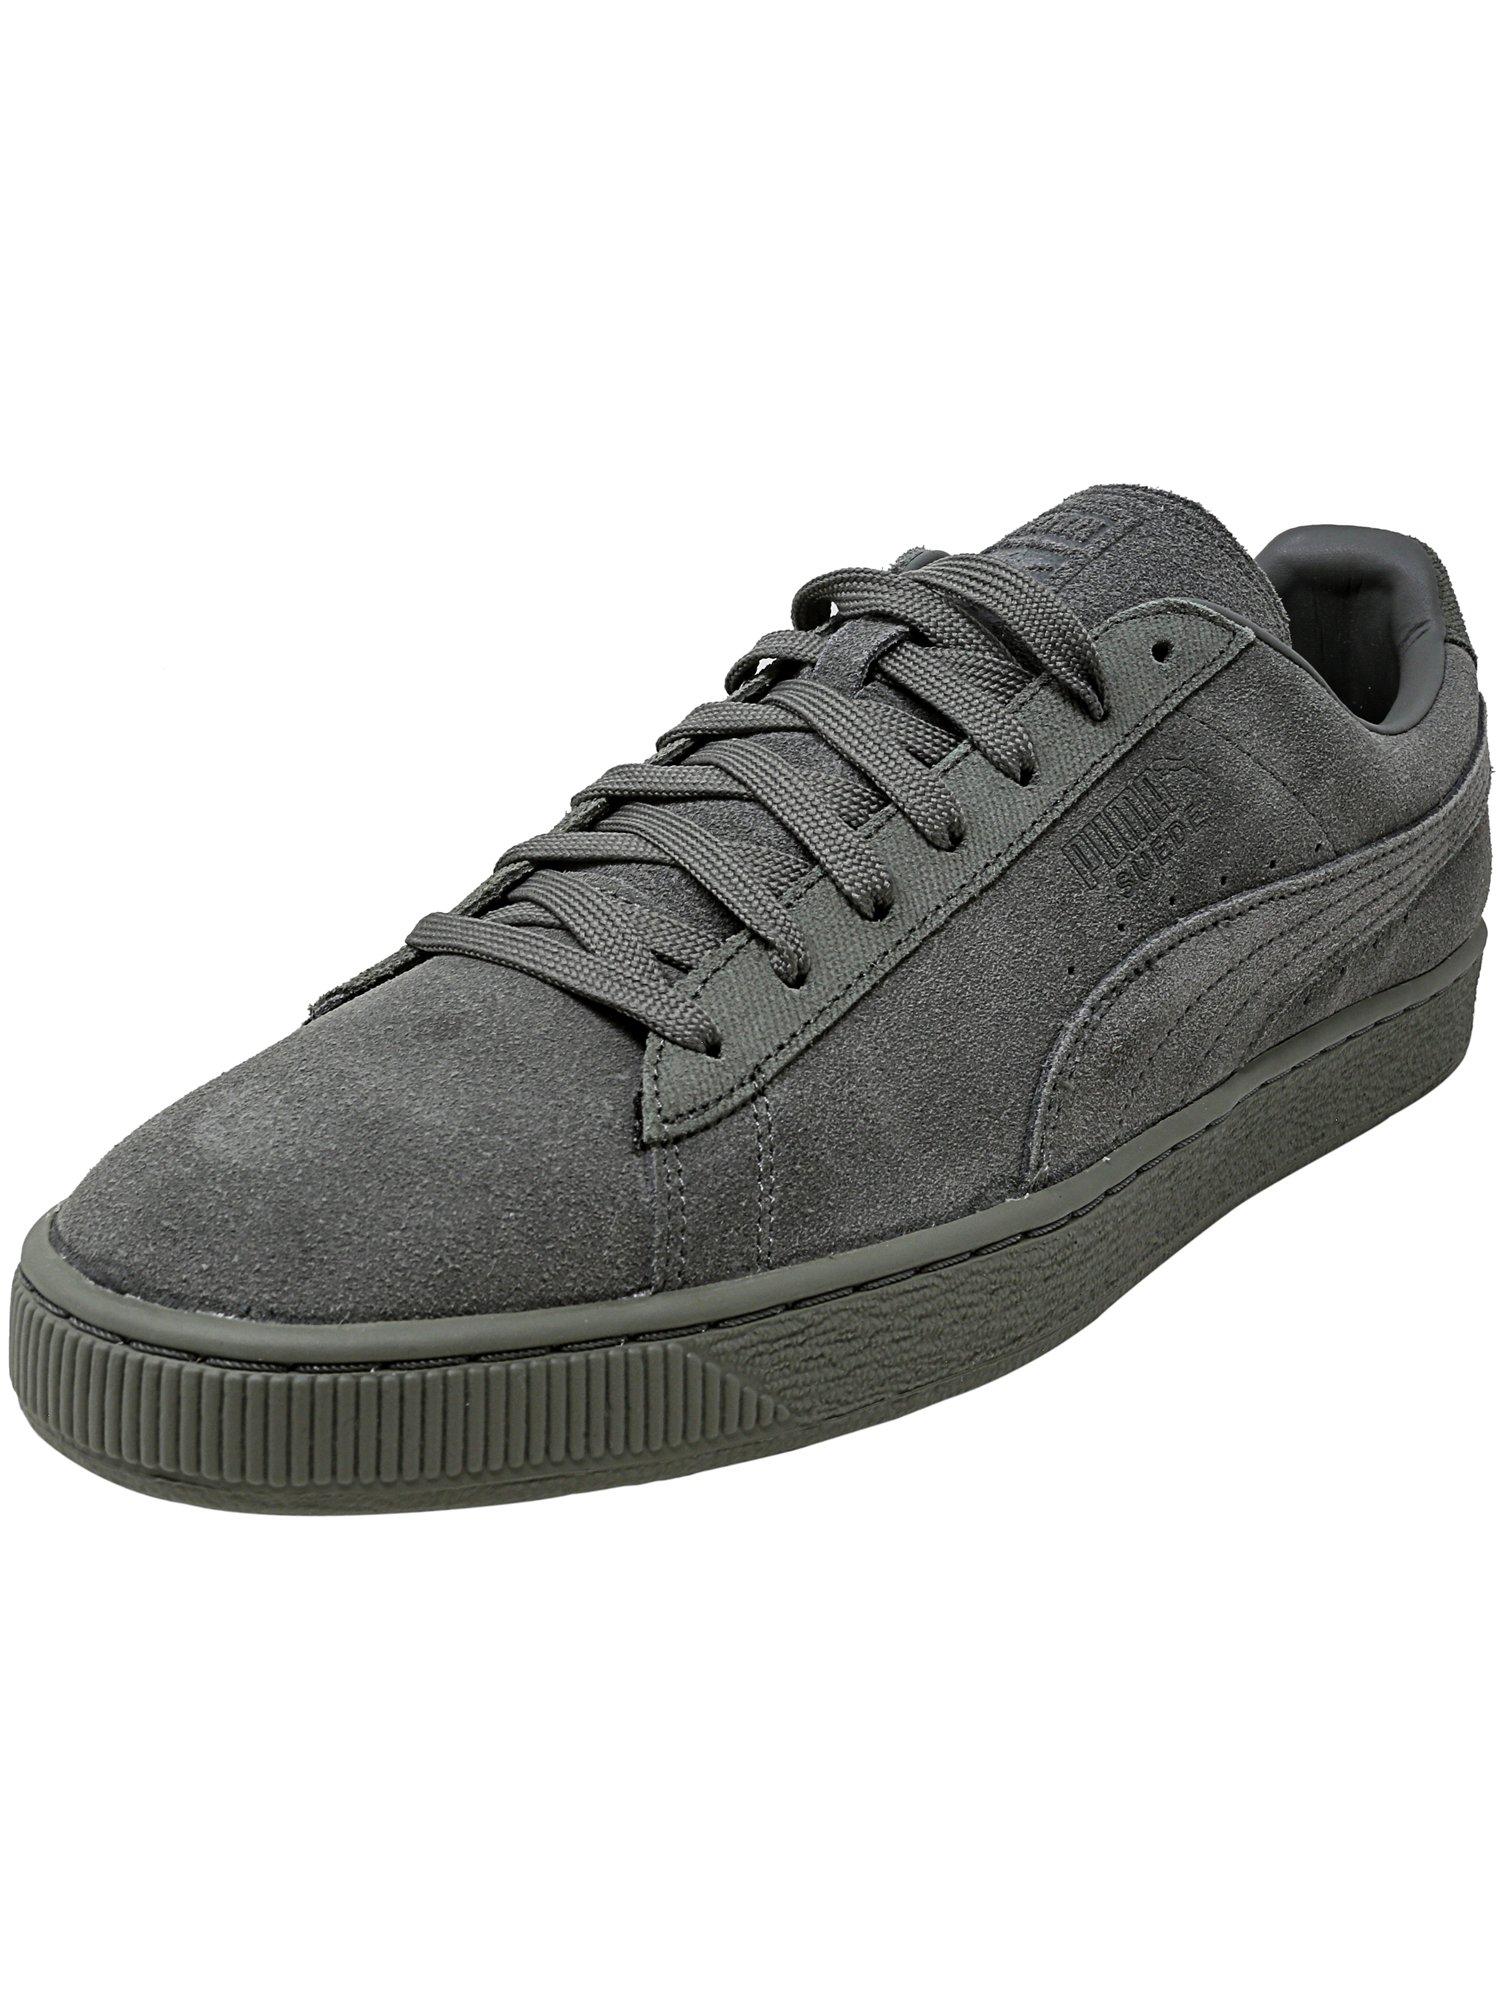 Puma Men's Classic Tonal Suede Natural Vachetta Ankle-High Fashion Sneaker - 10M